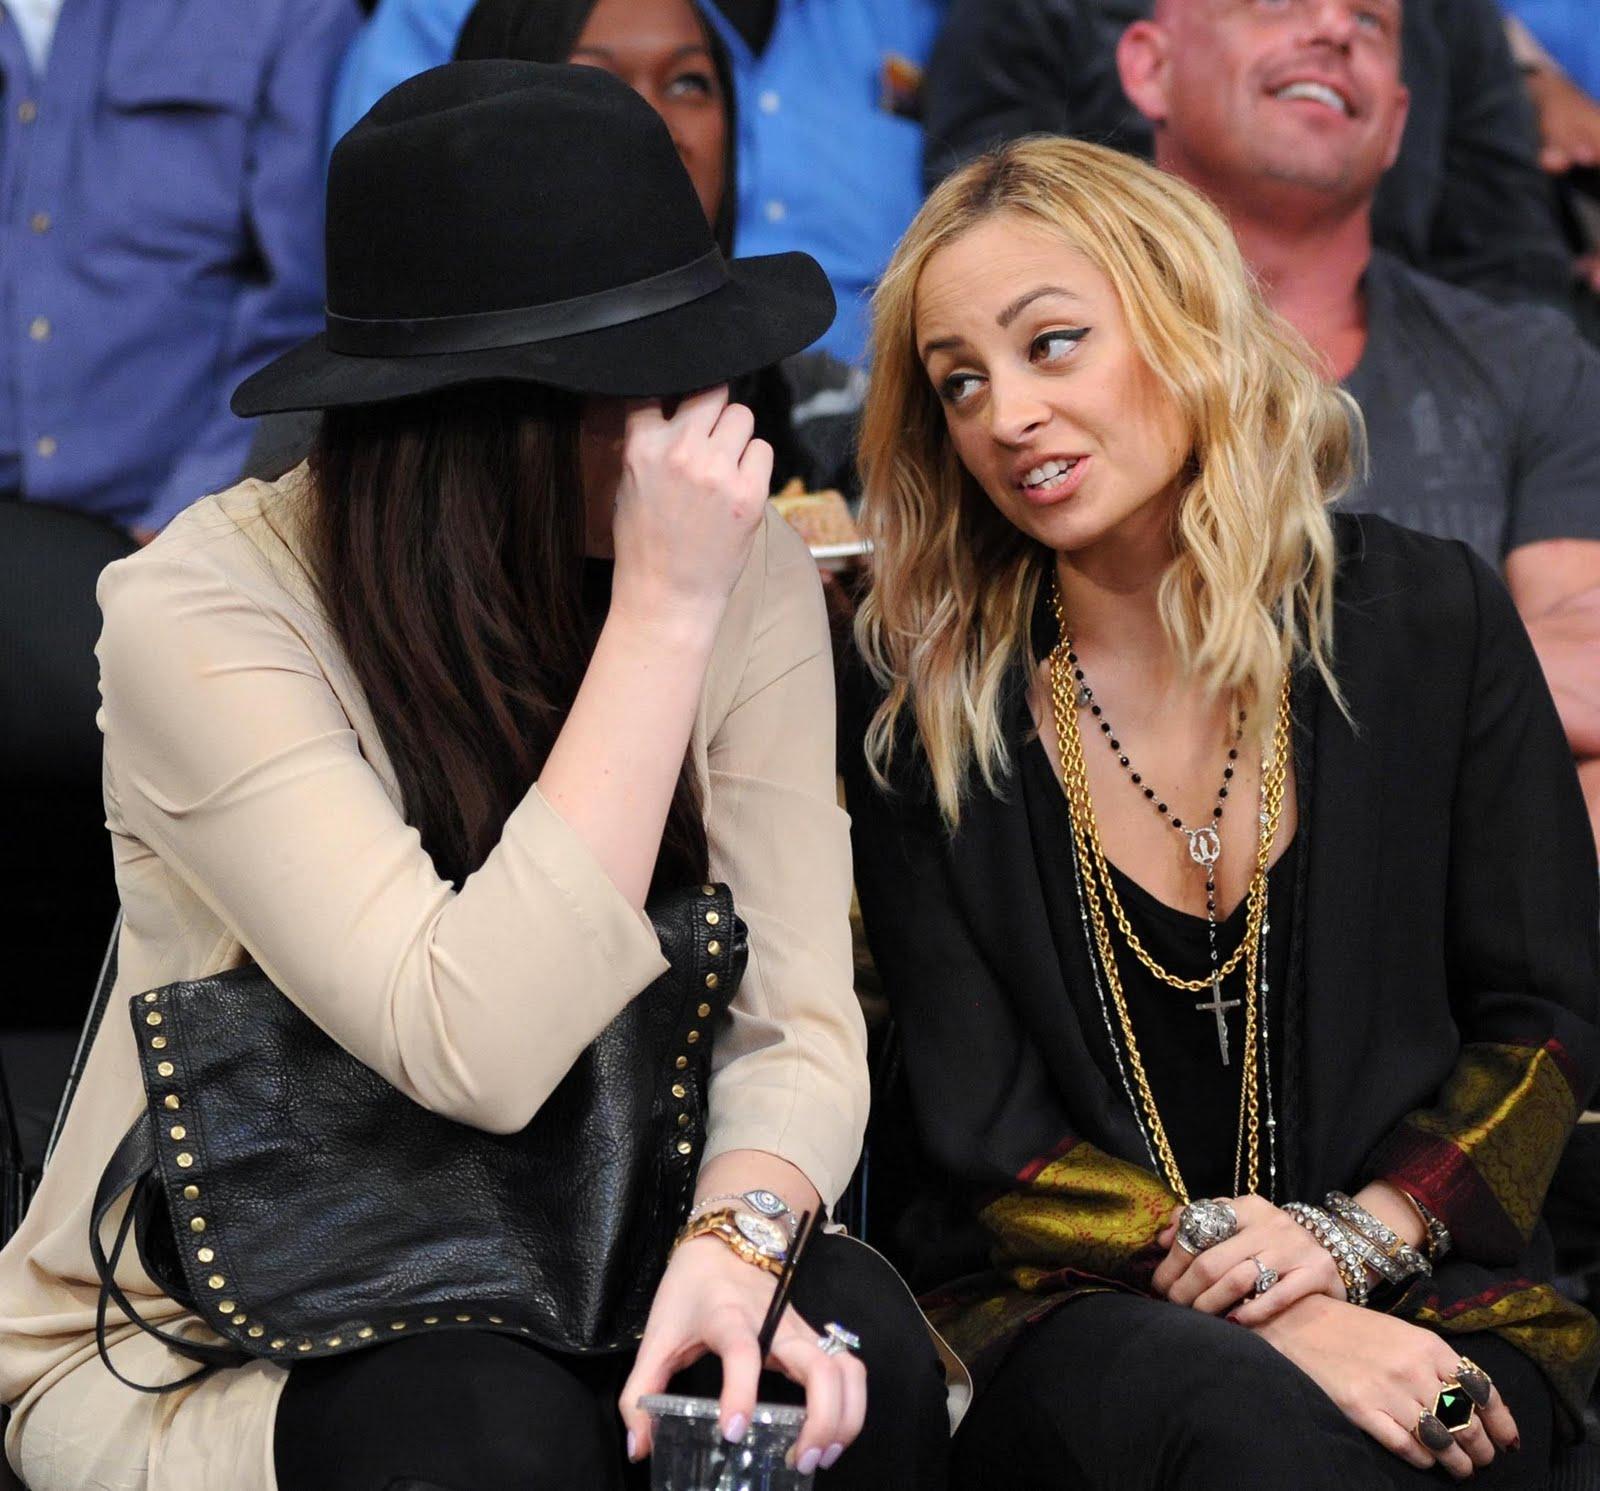 http://3.bp.blogspot.com/_O3gM_t4mi78/TUbb2XKlPcI/AAAAAAAABns/pWWpgTdKATw/s1600/nicole-richie-khloe-kardashian-lakers-7.jpg